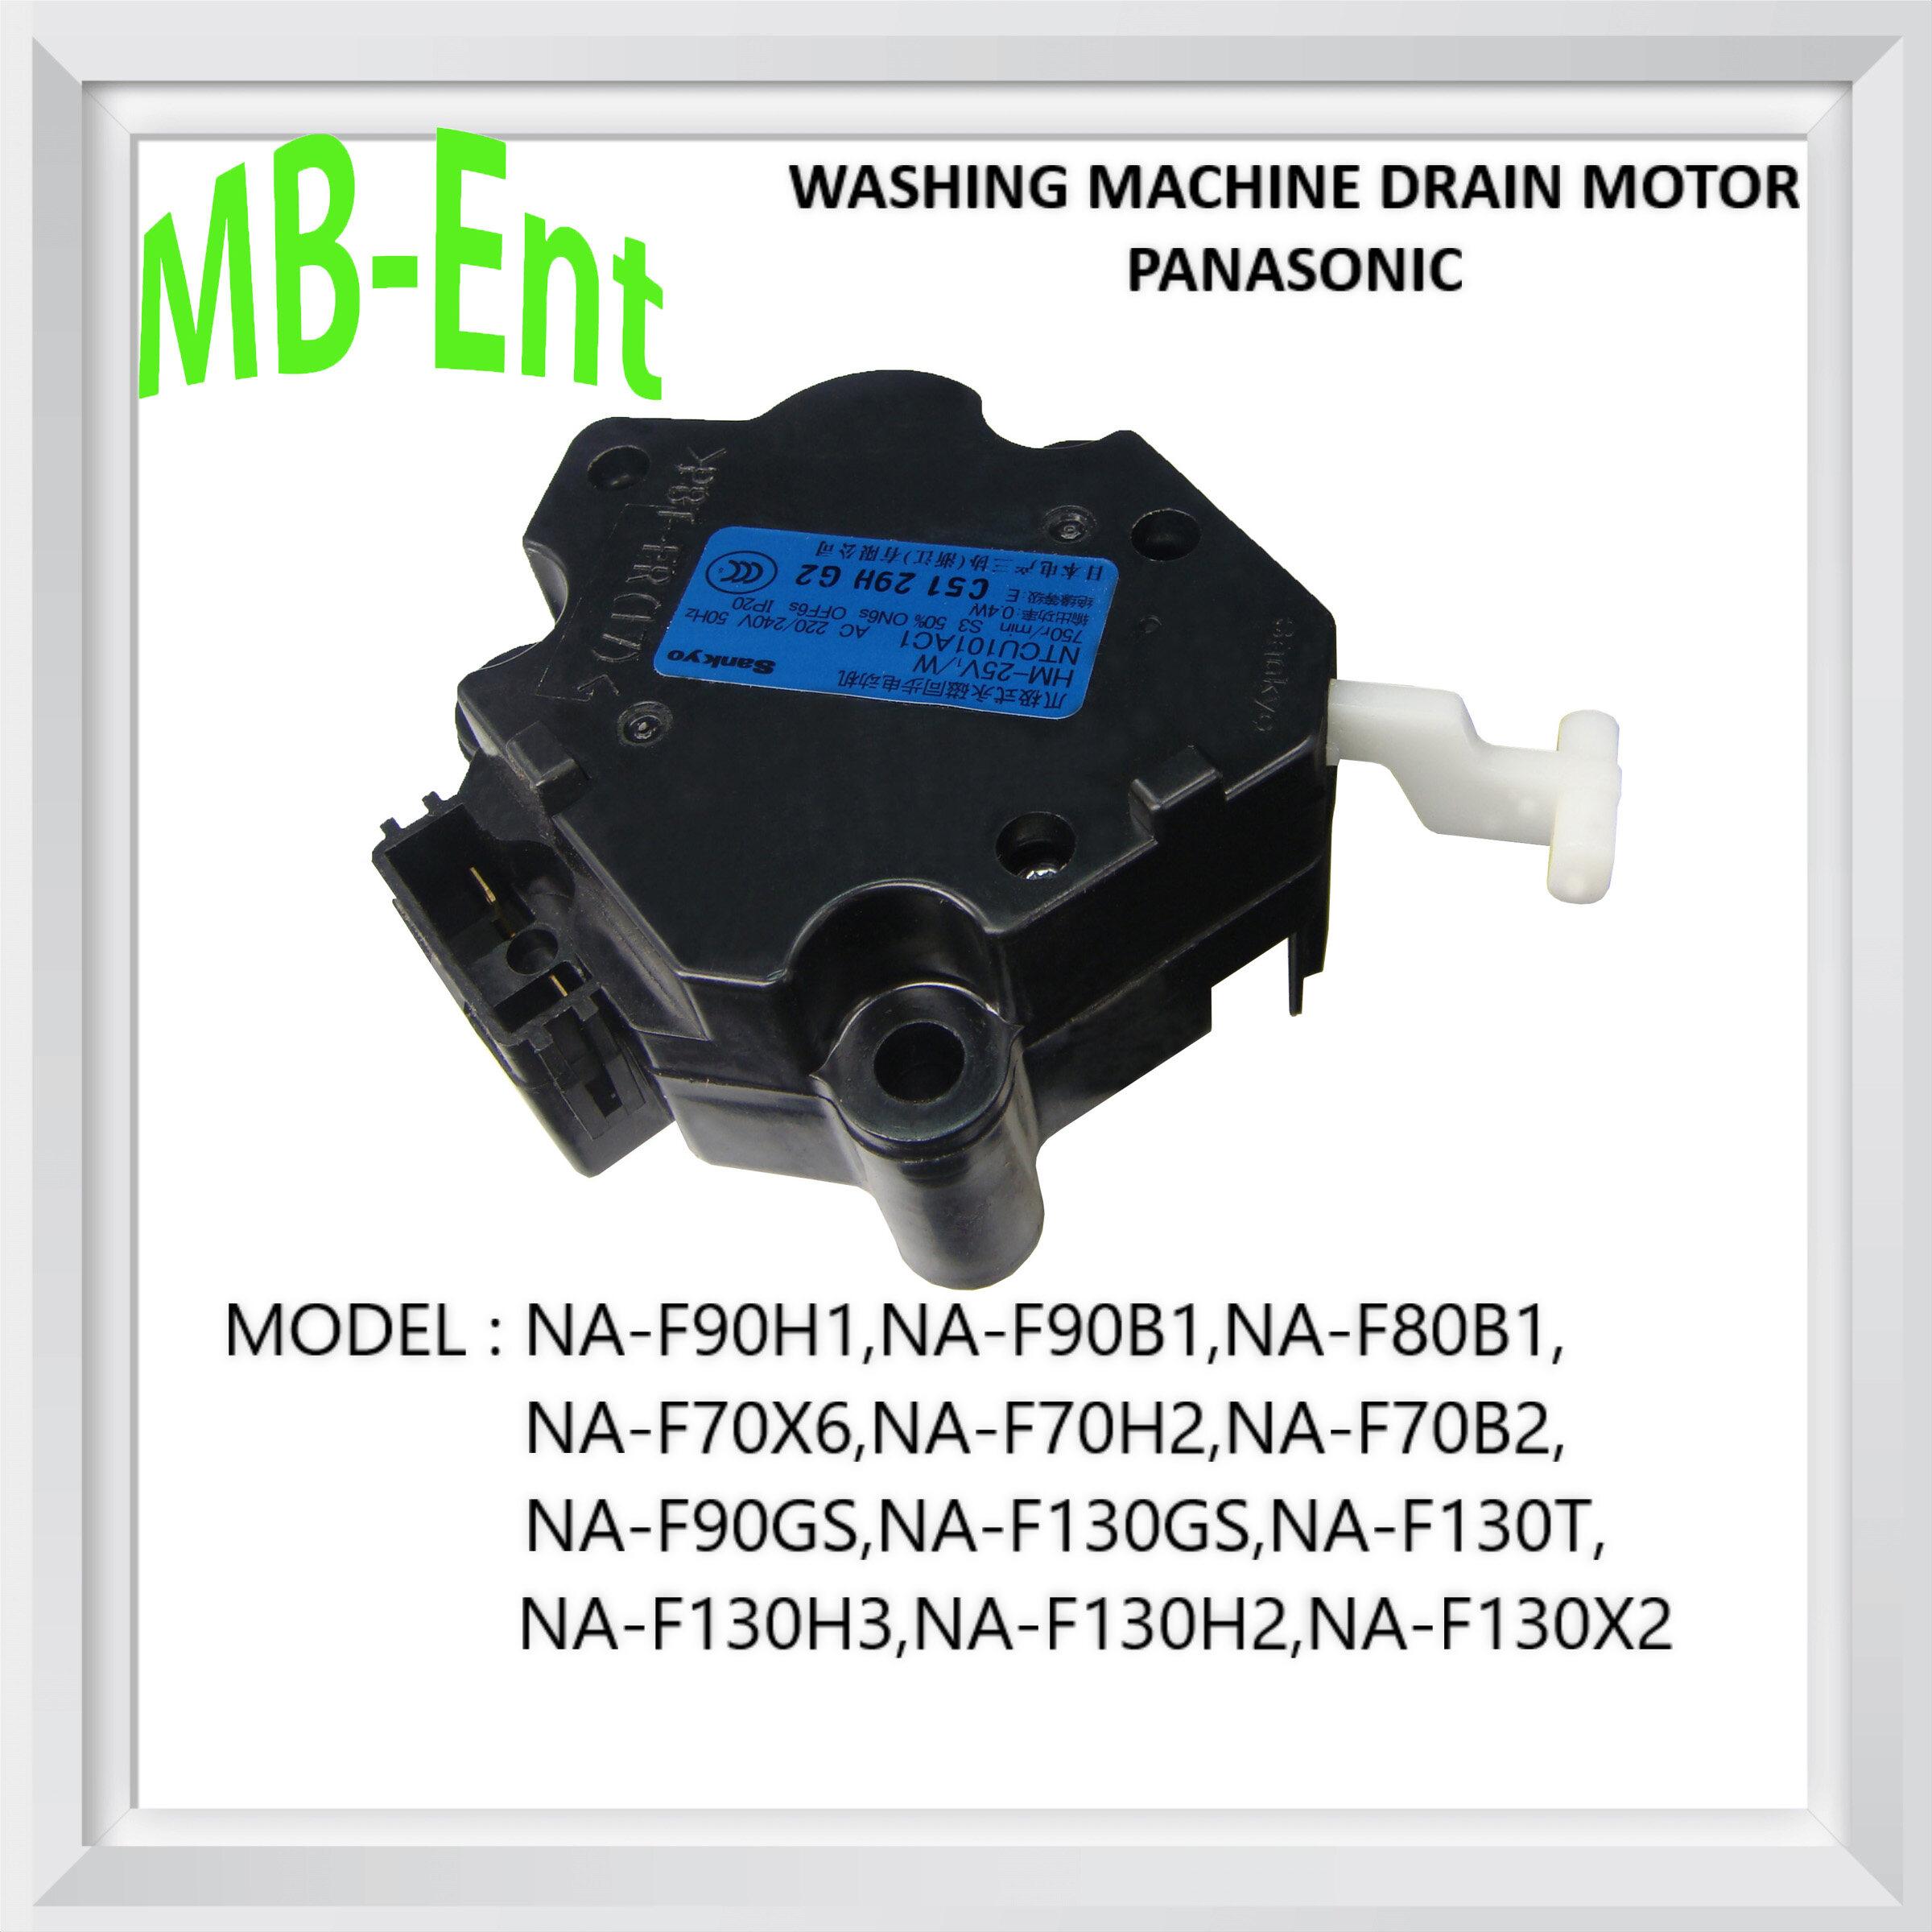 MY BAJET ELEKTRONIK DRAIN MOTOR PANASONIC NA-F90H1